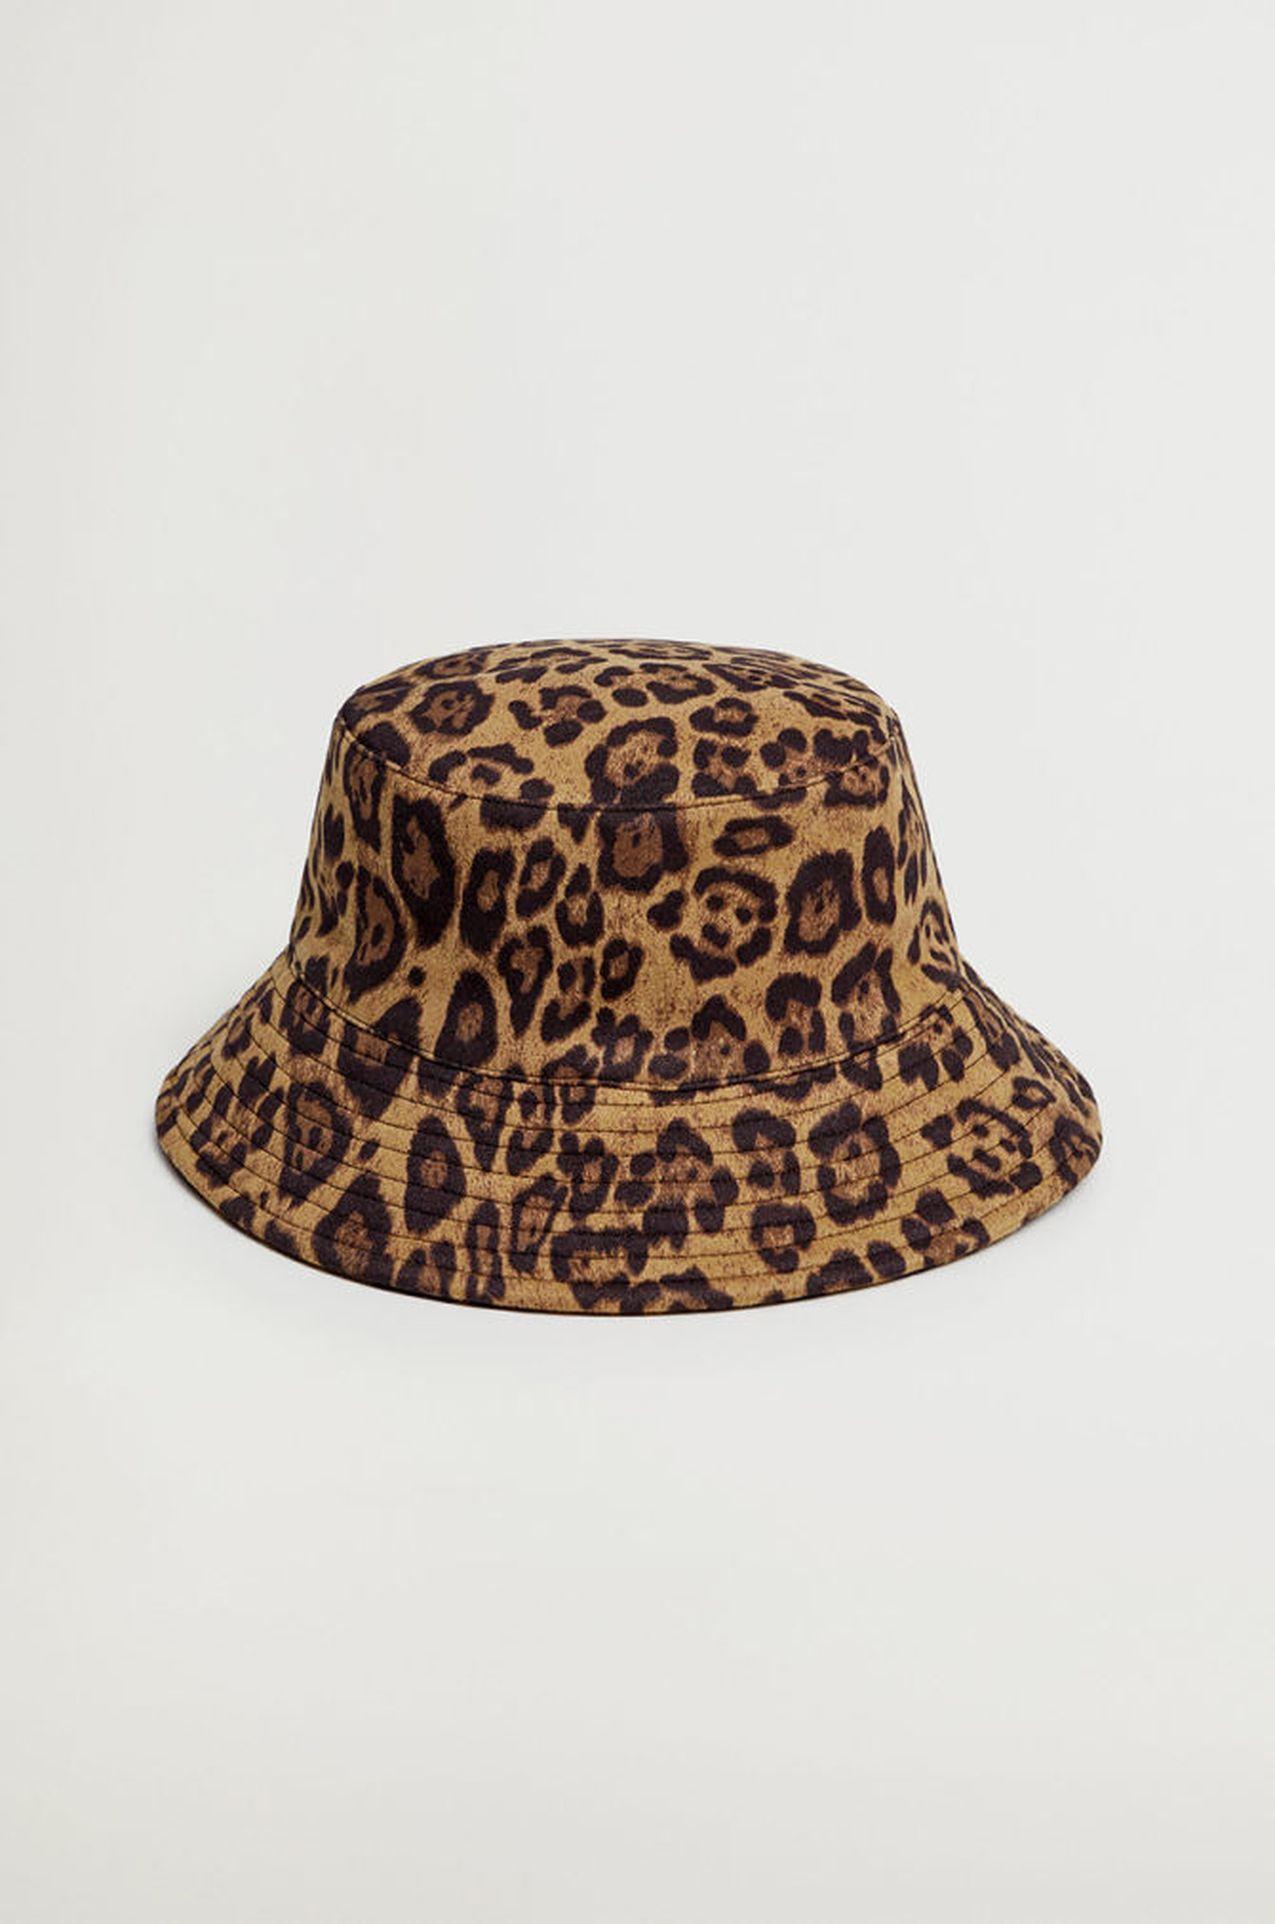 Panterkowy buckhet hat